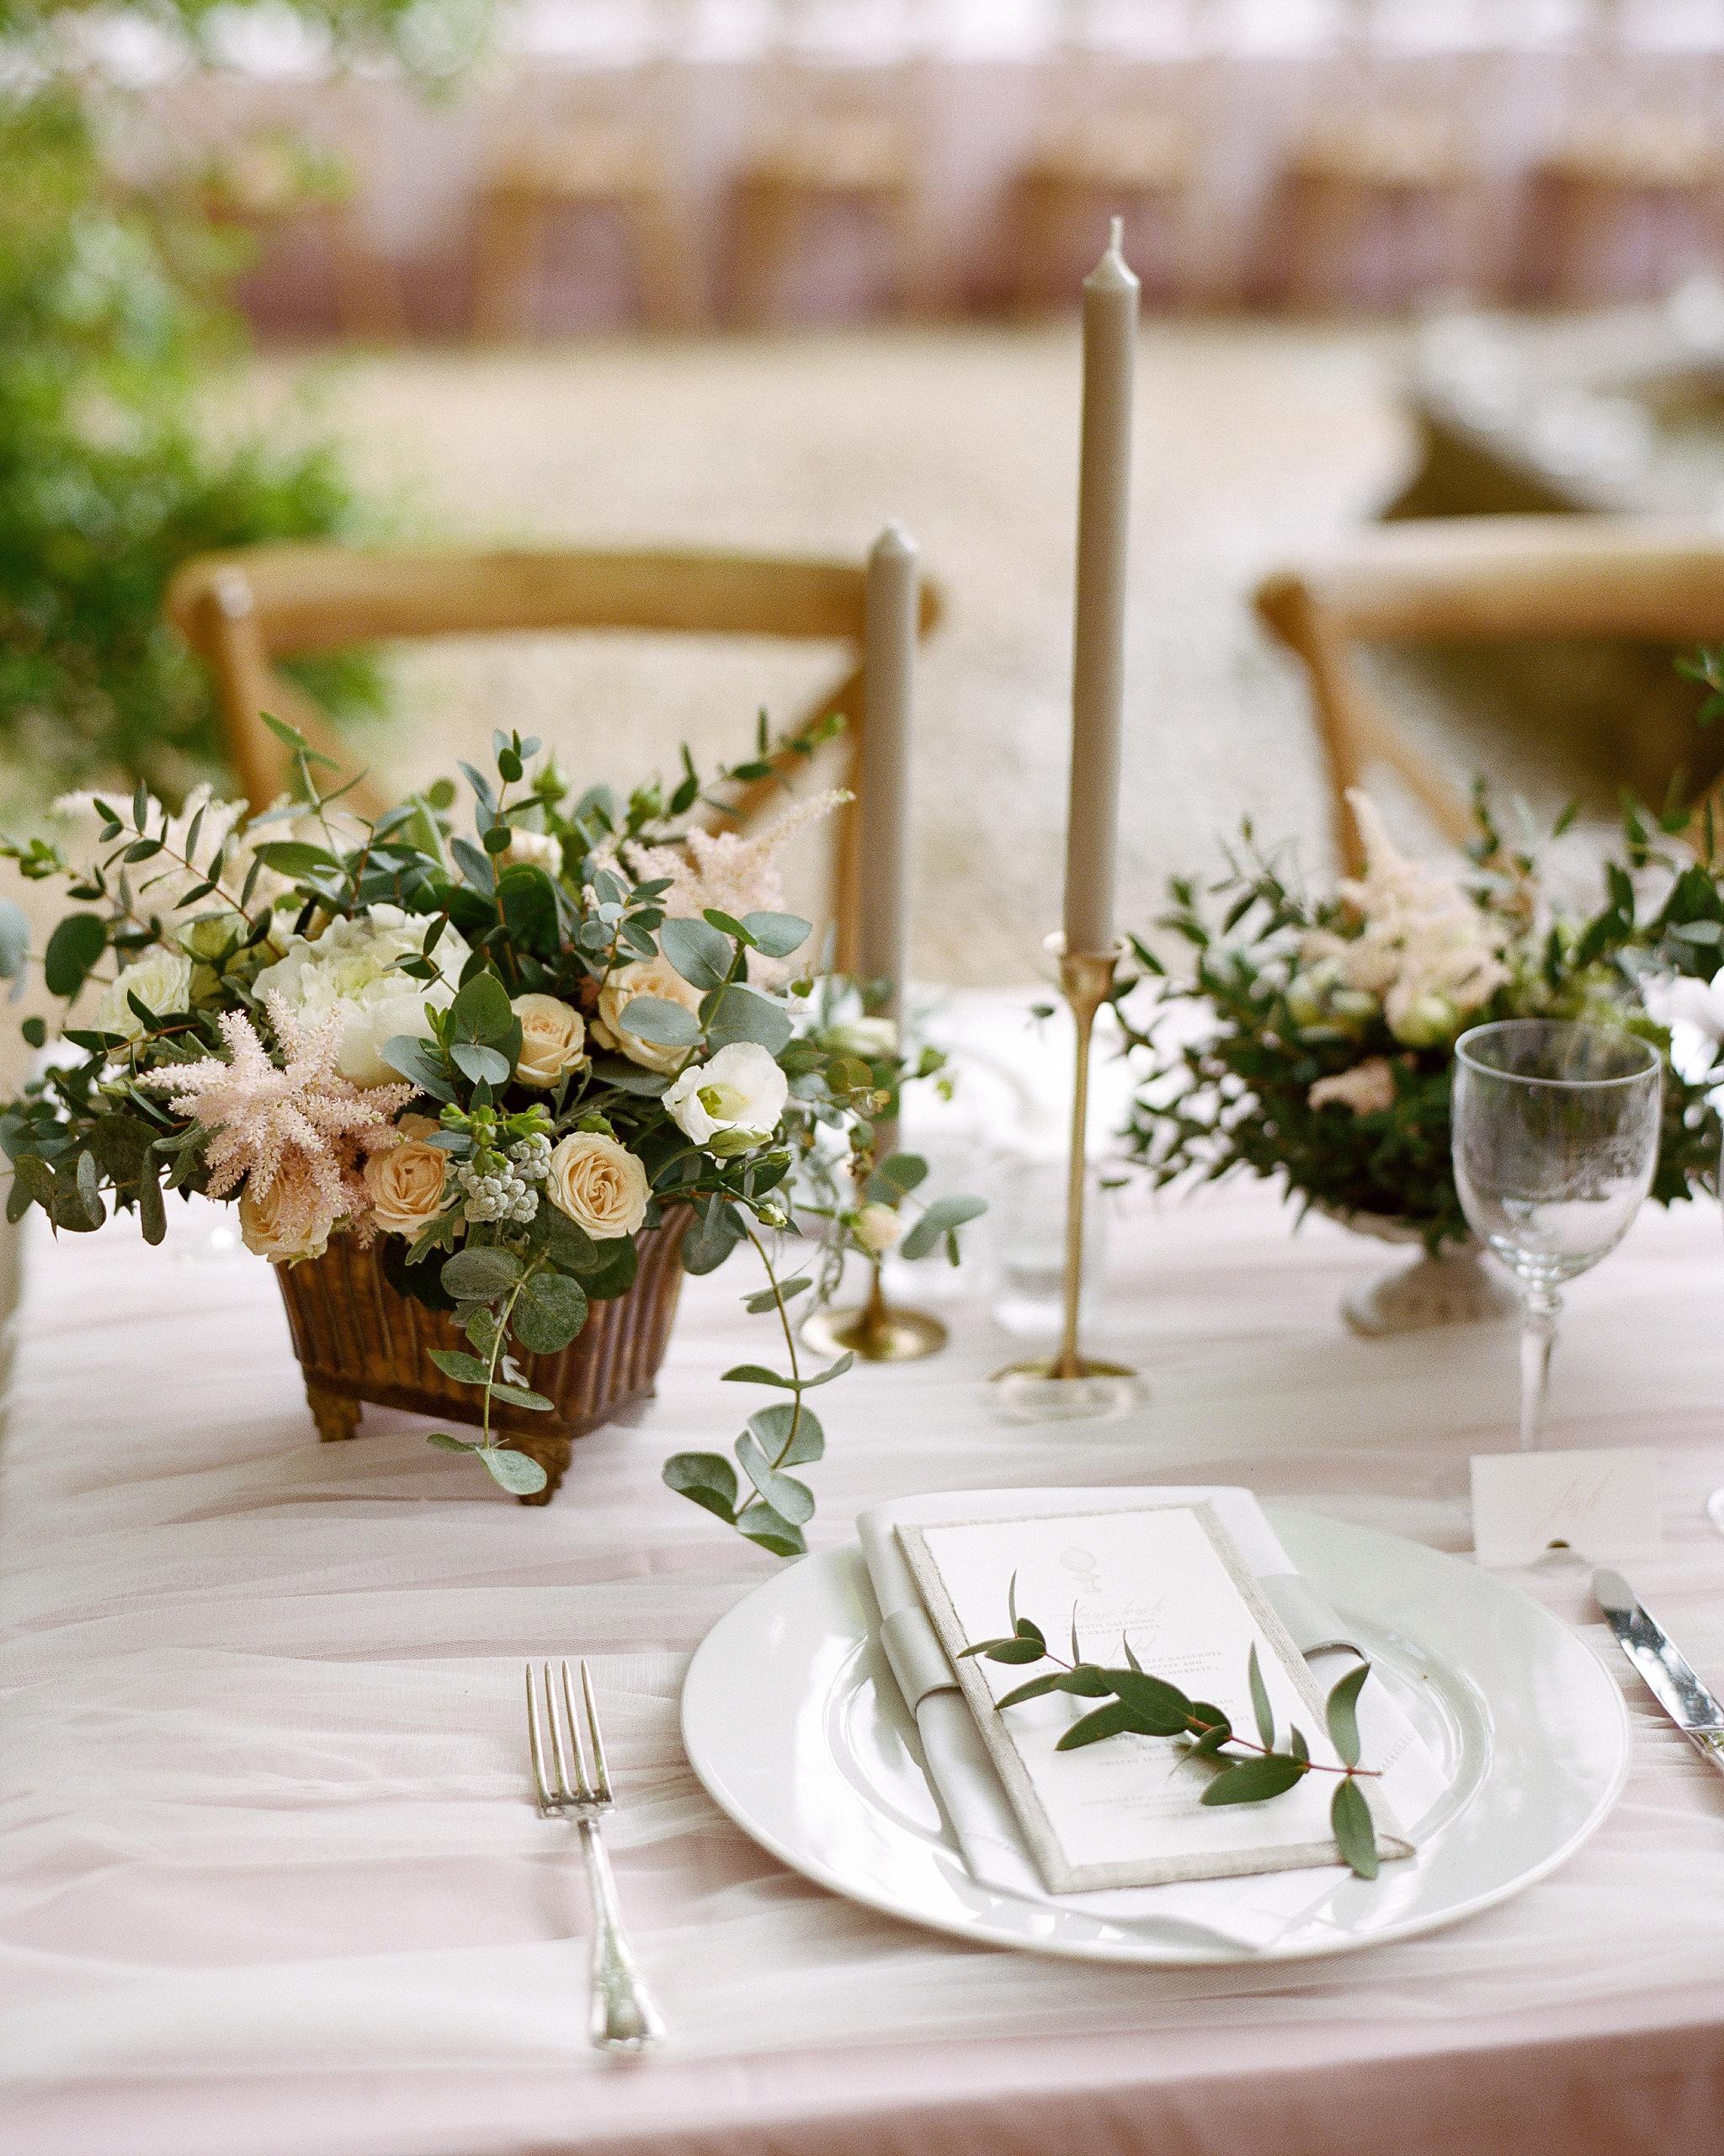 julie-chris-wedding-placesetting-1399-s12649-0216.jpg